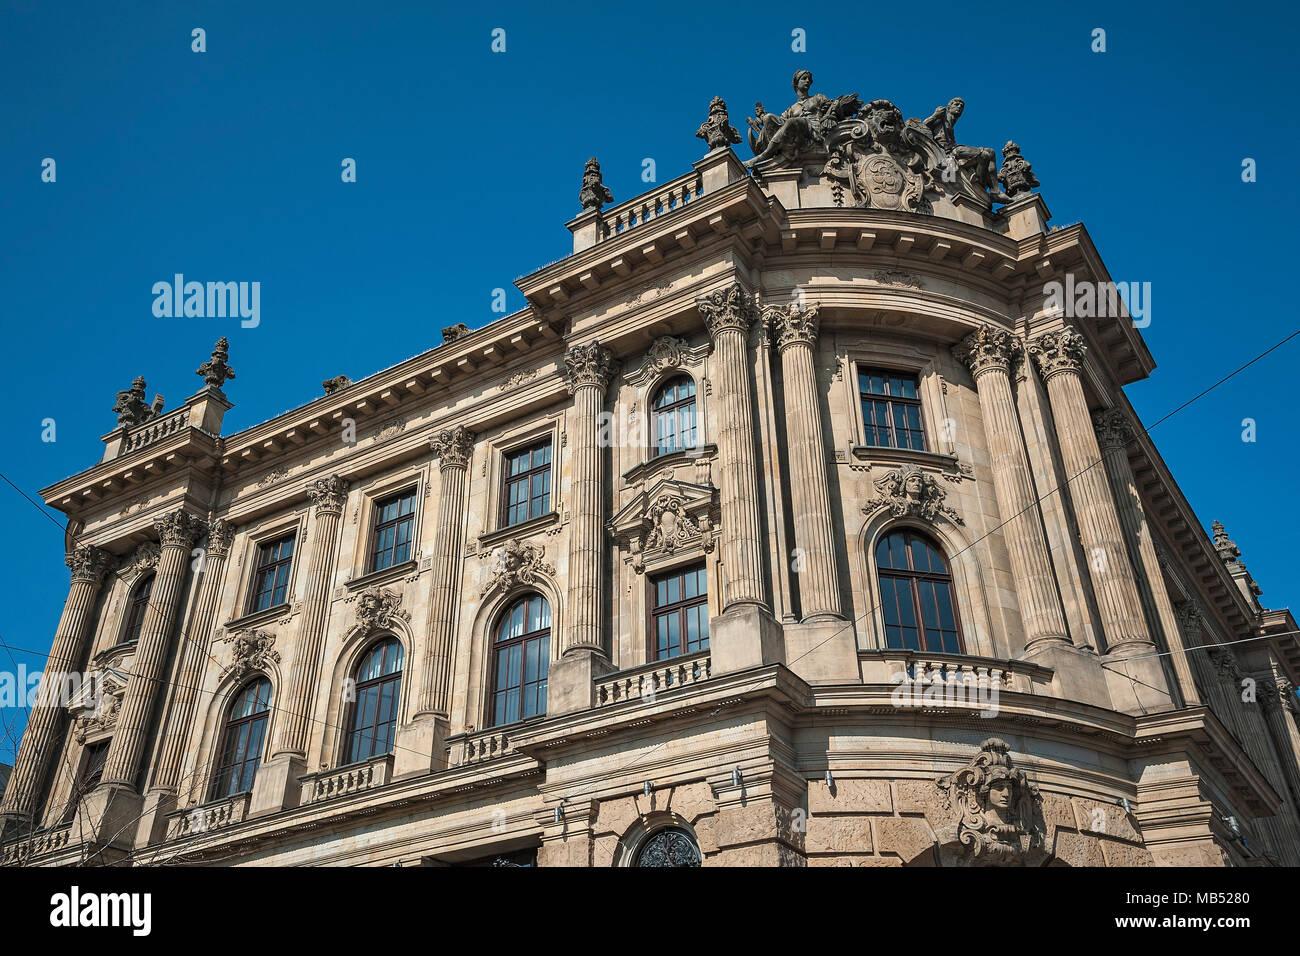 Old Stock Exchange from the Gründerzeit, Lenbachplatz, Munich, Bavaria, Germany - Stock Image